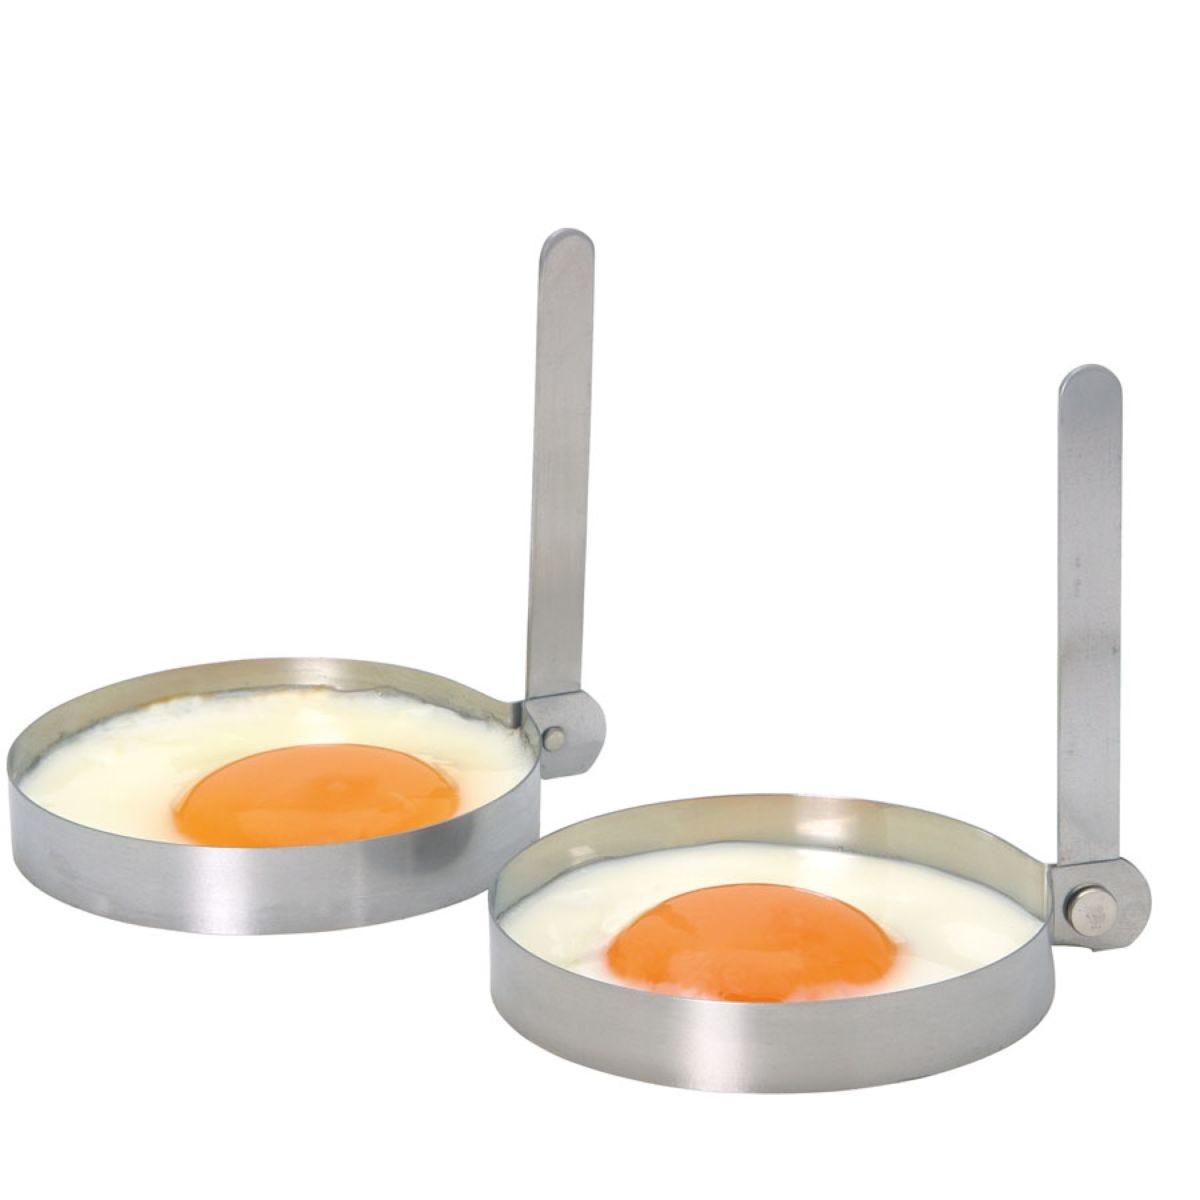 KitchenCraft Round Egg Rings